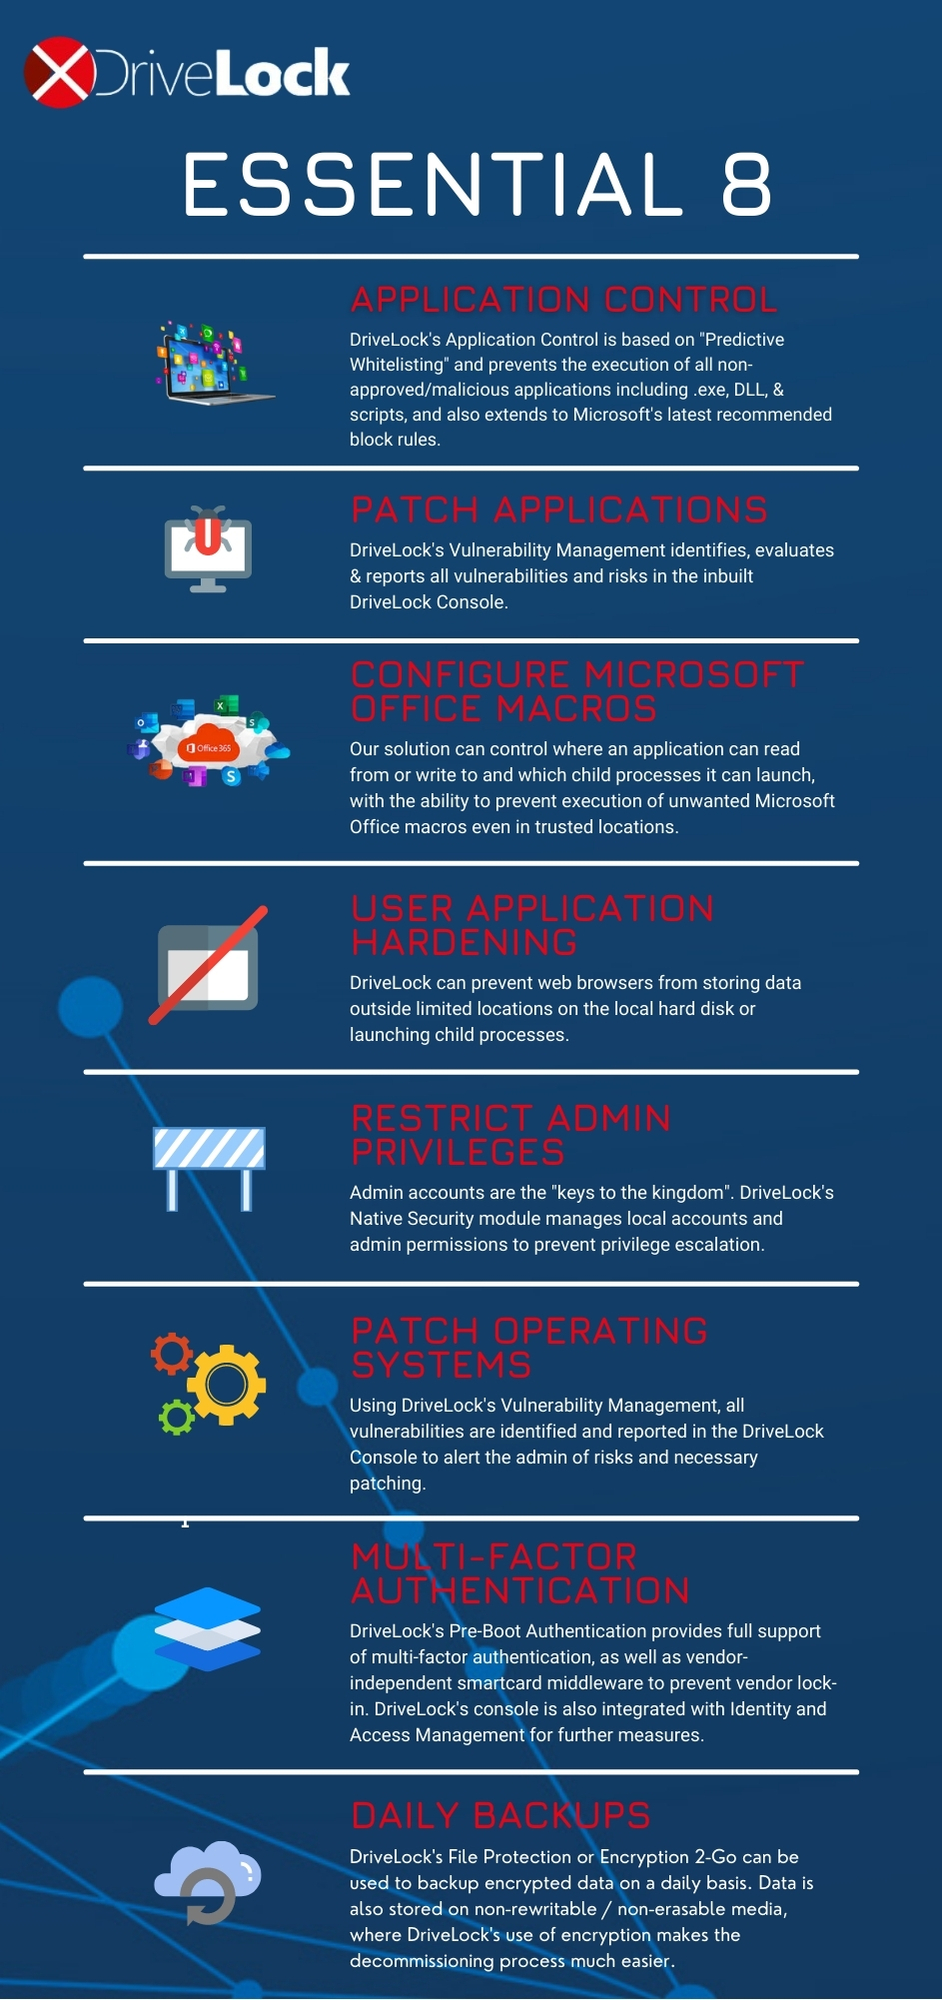 Essential 8 Infographic